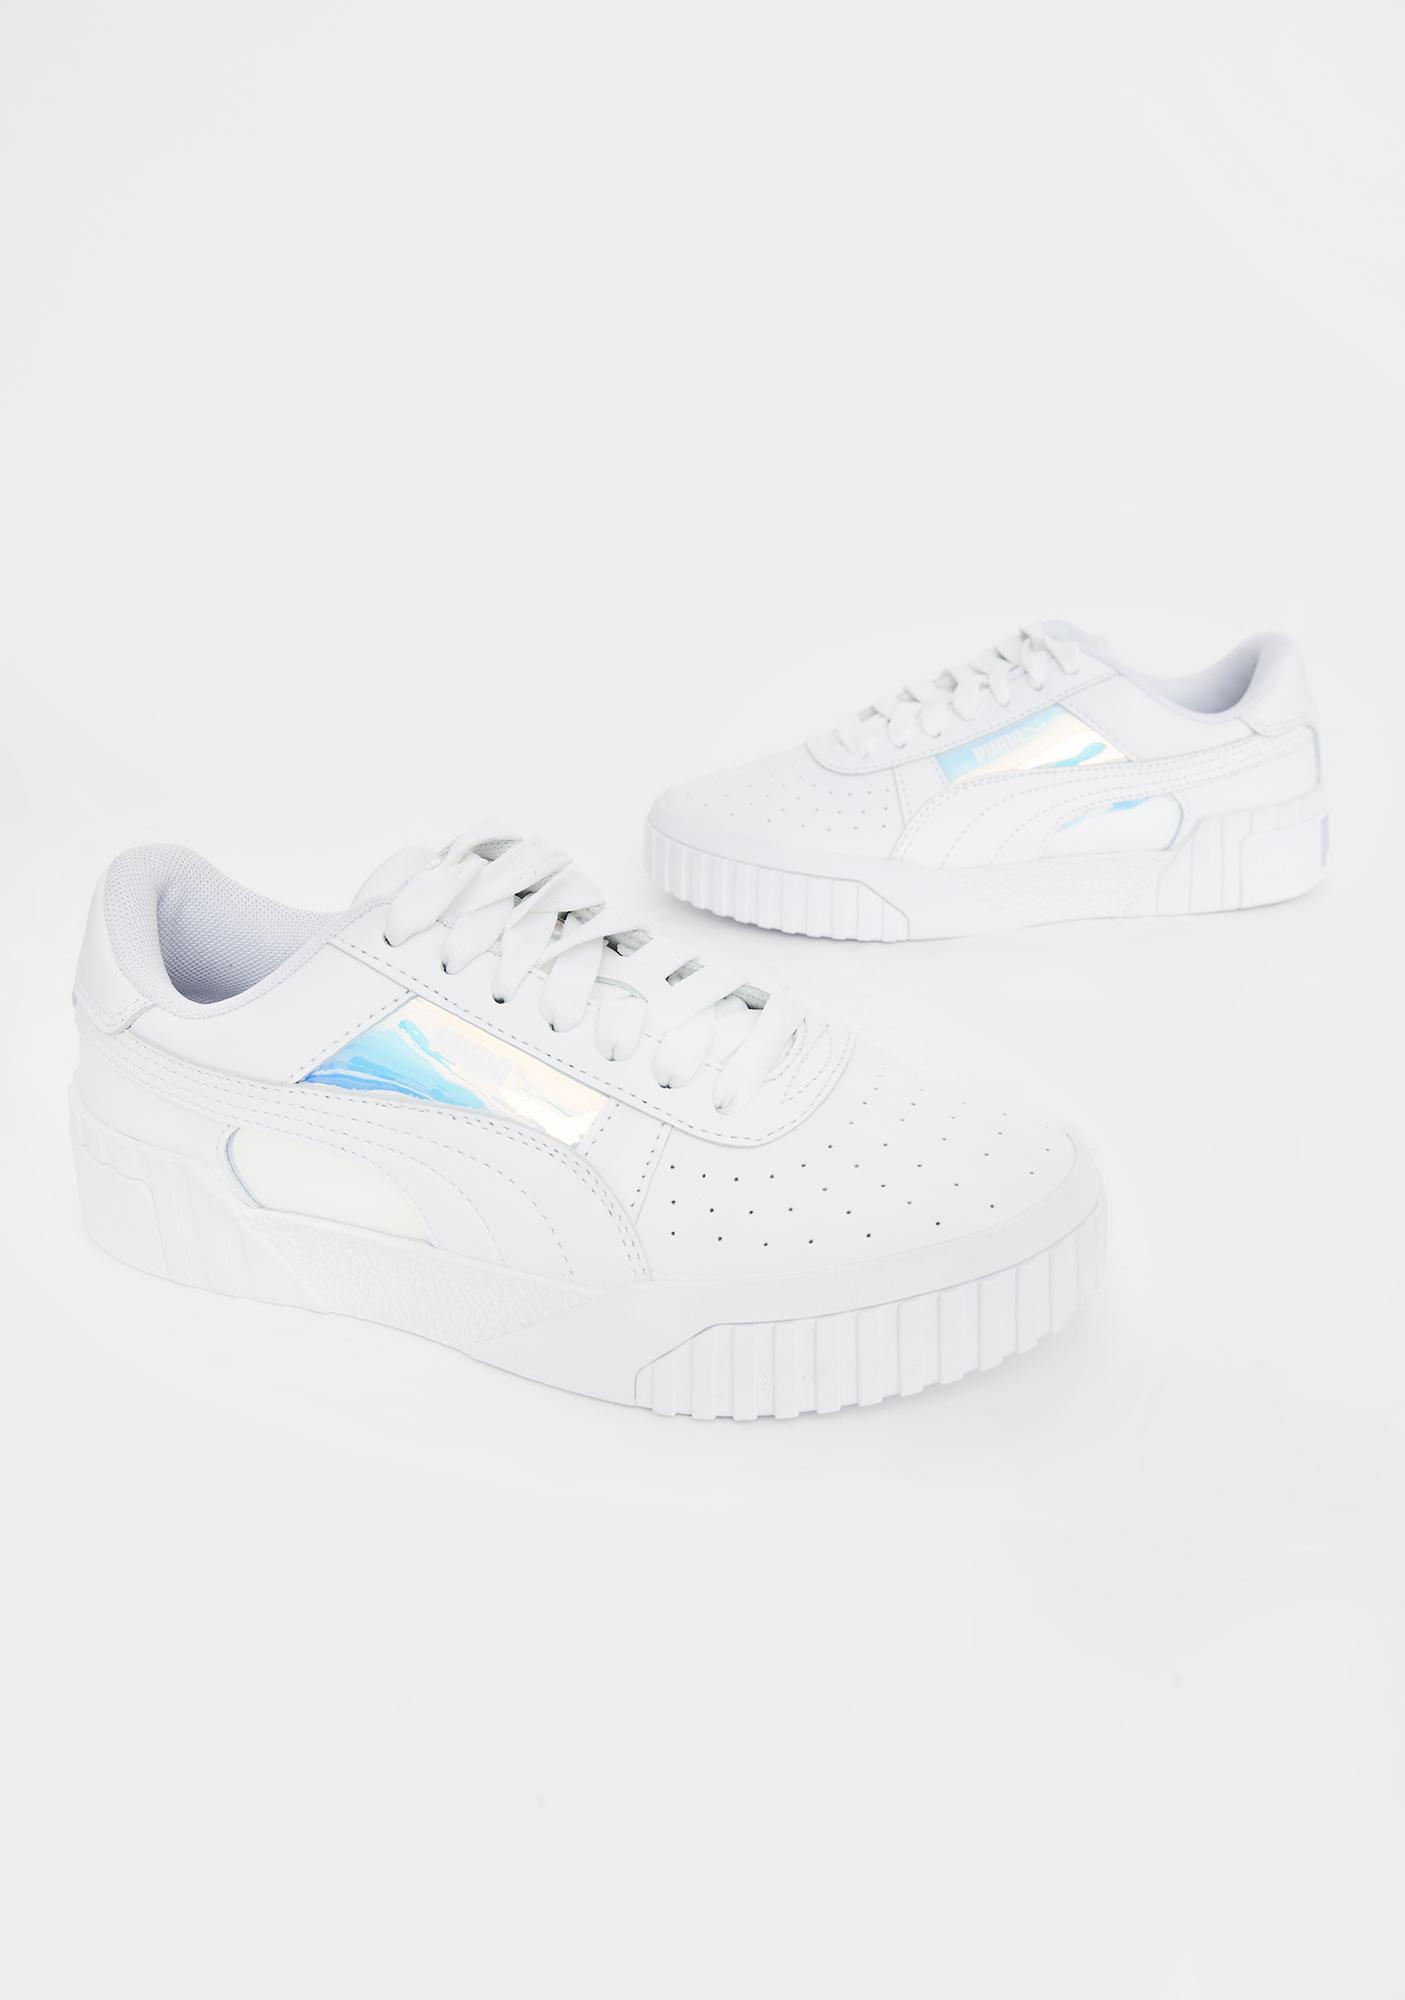 PUMA Iridescent Cali Glow Sneakers